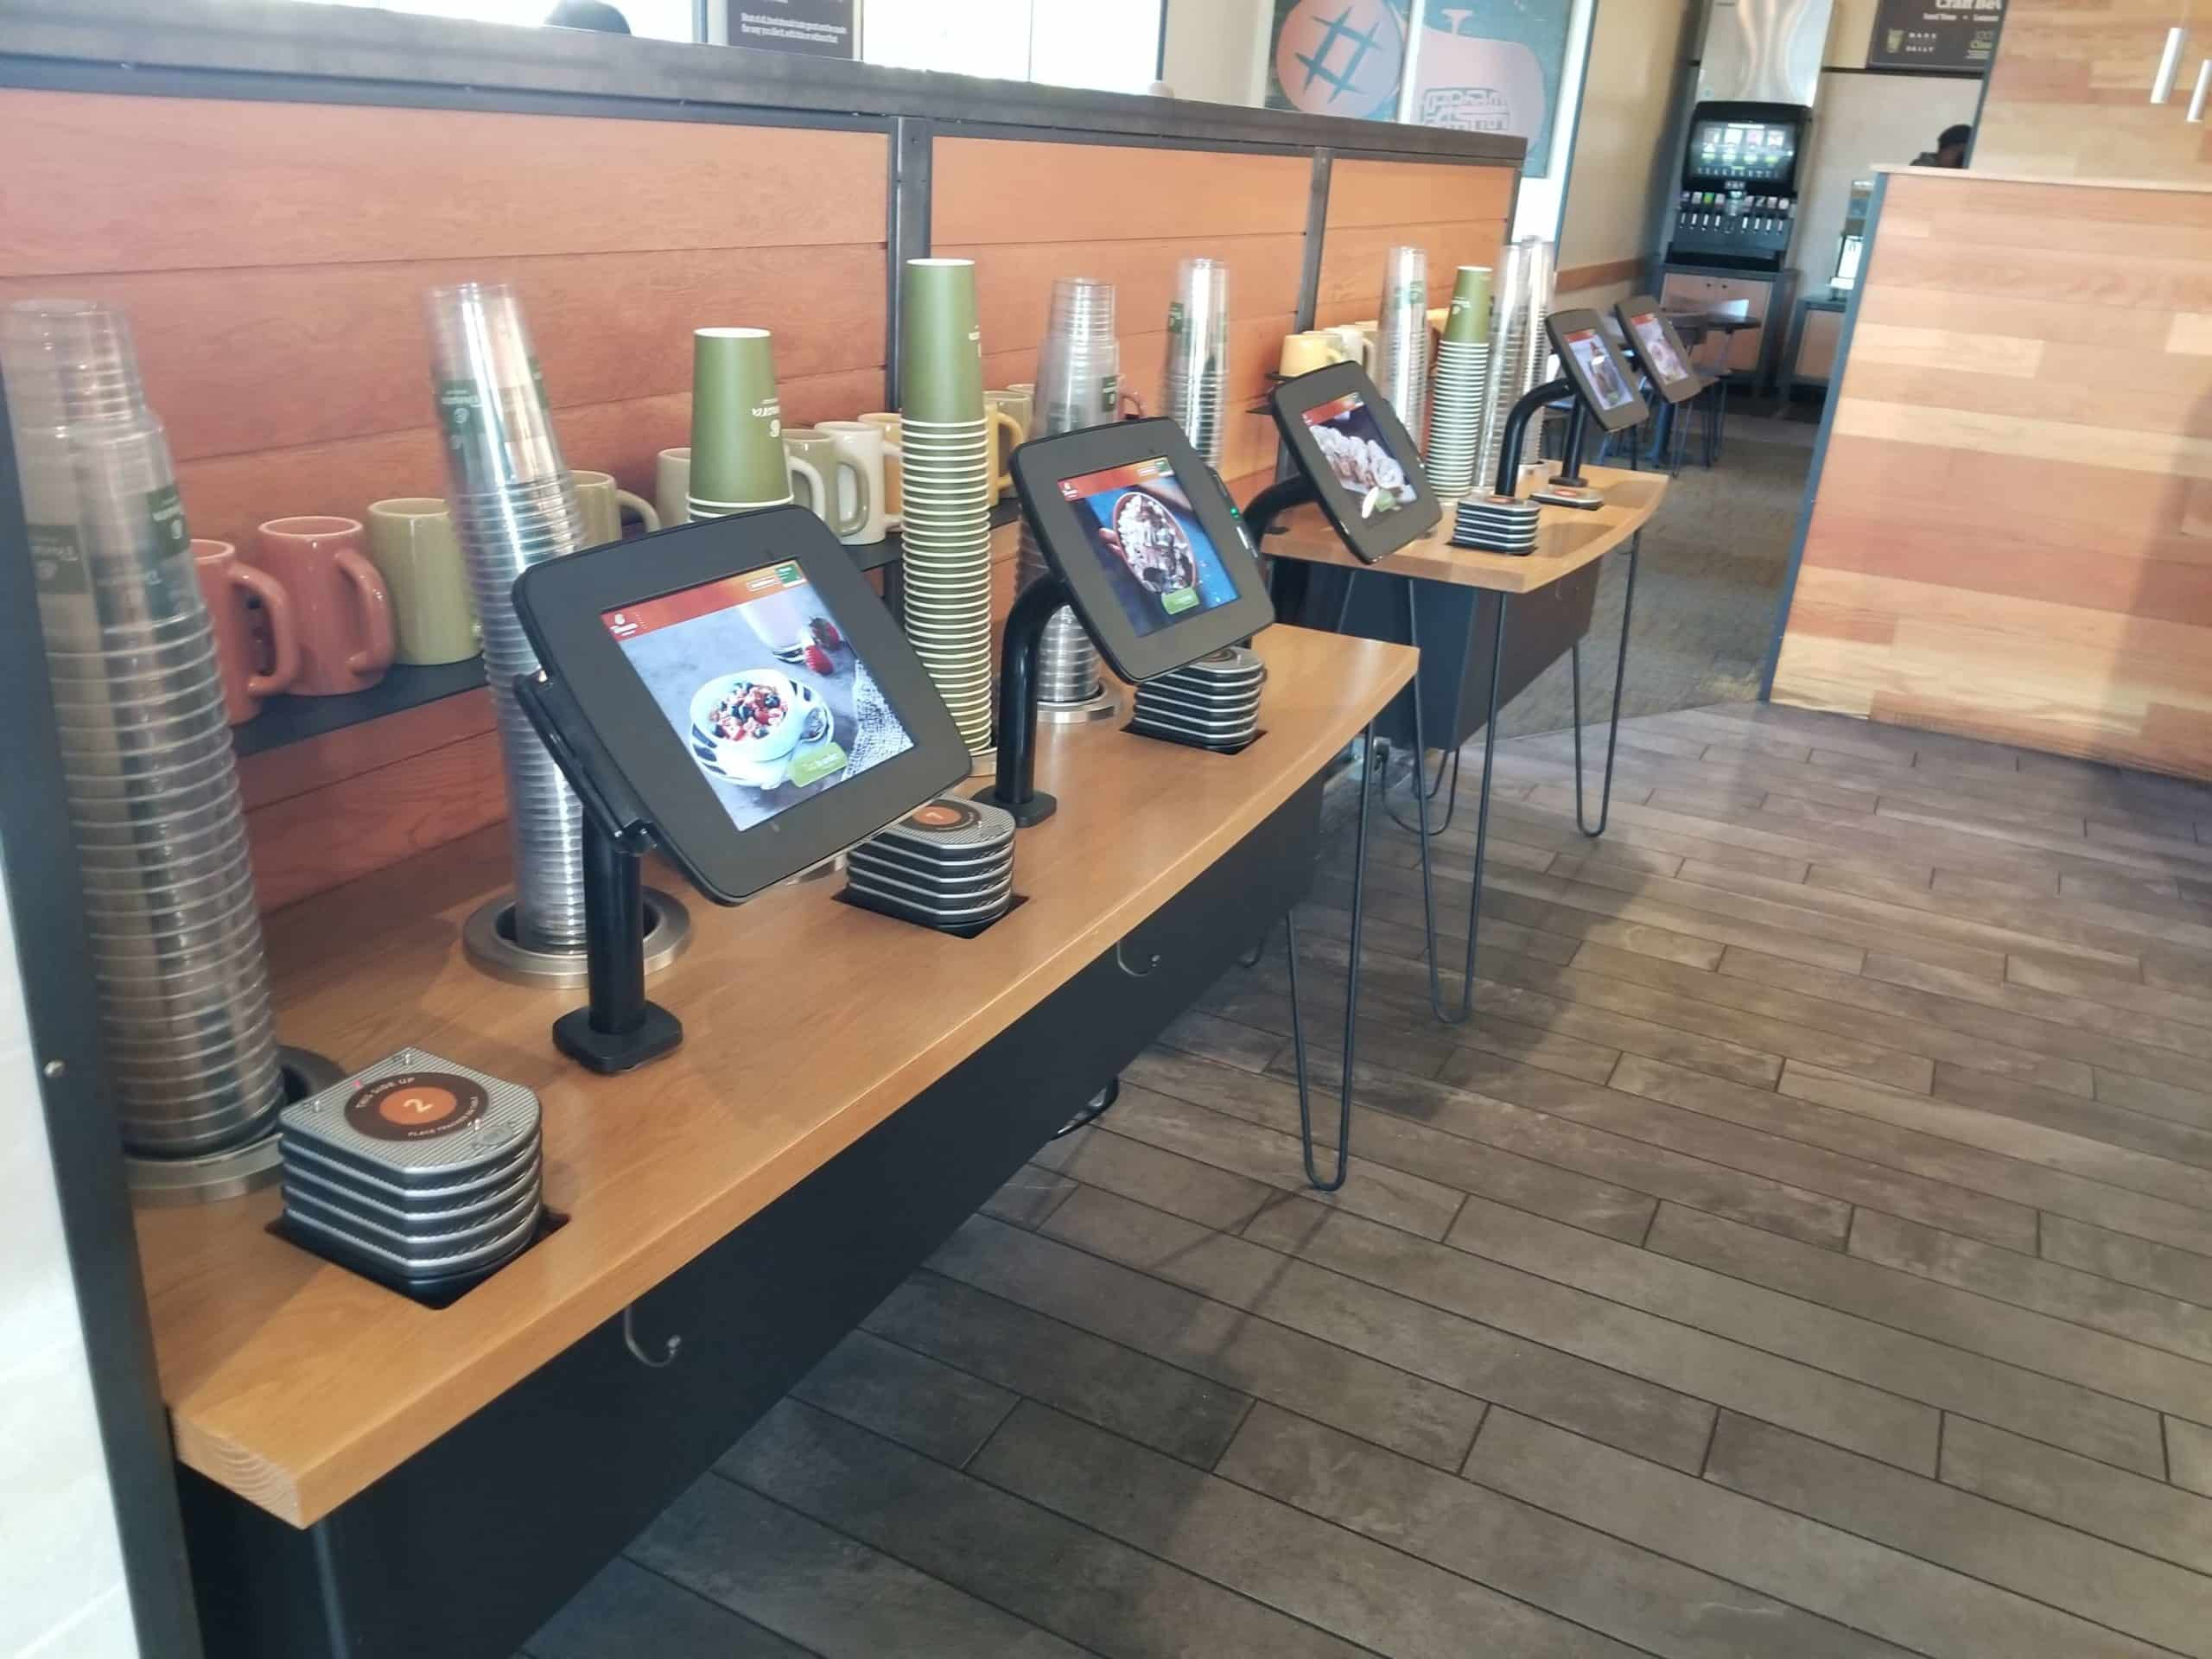 panera bread モバイルオーダー販売システム